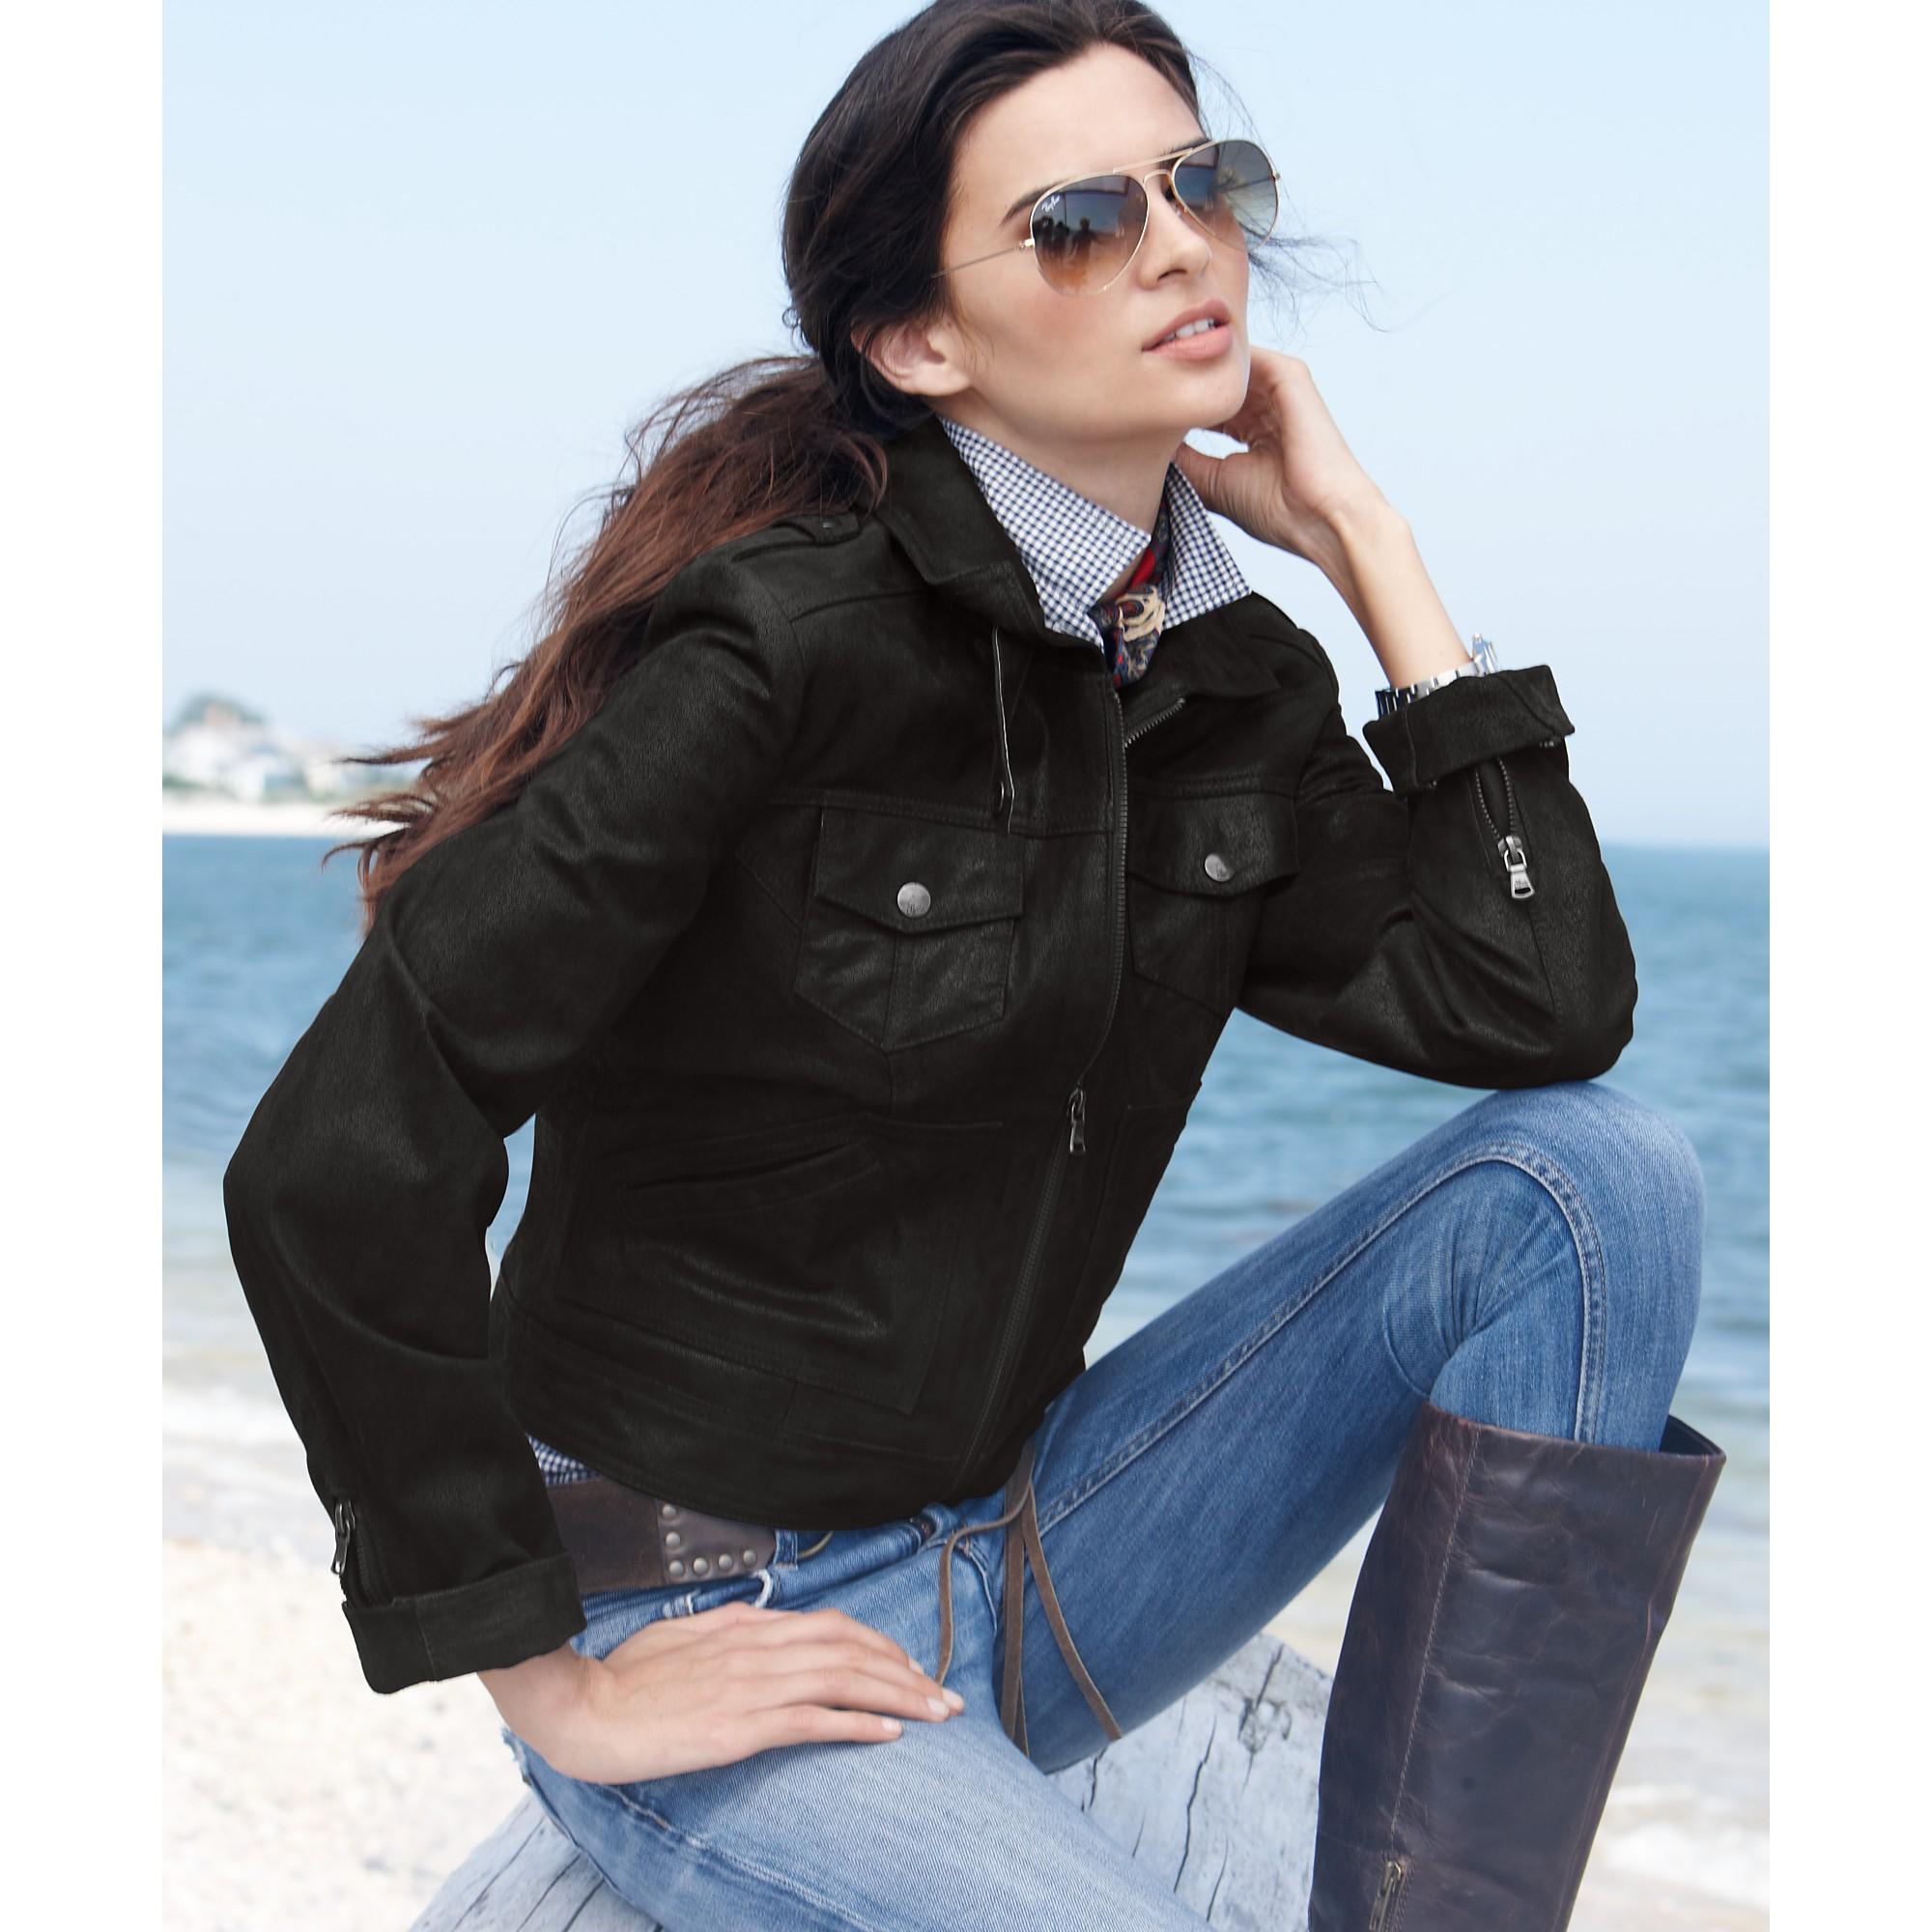 3a5c8a91df311 Jennifer Lamiraqui for Vintage Dreams 2012 collections – Fashion ...